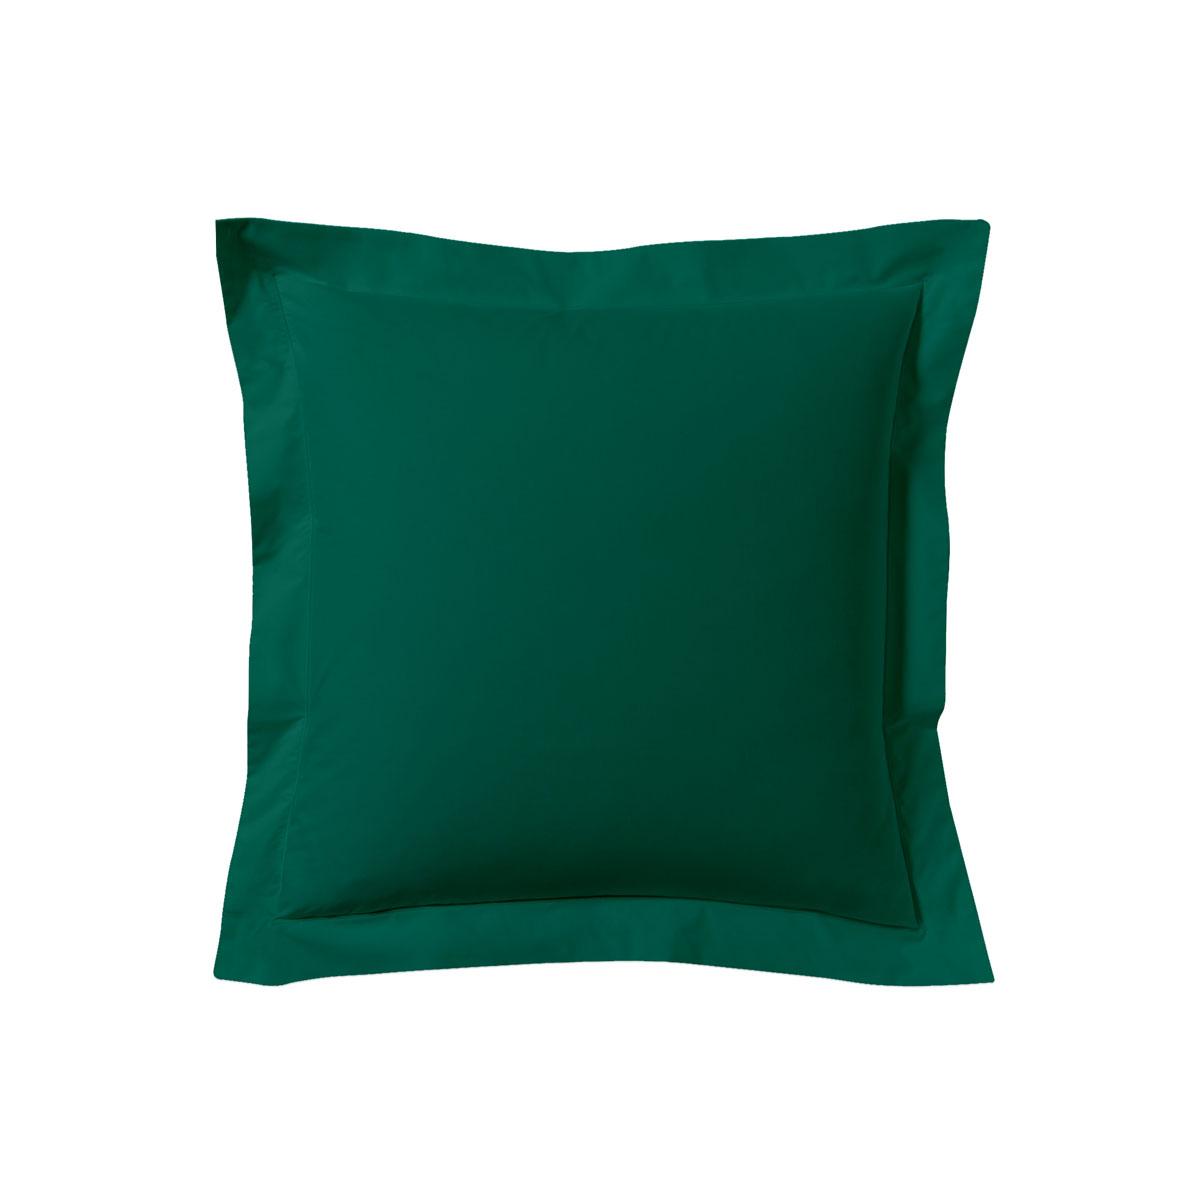 Taie d'oreiller unie en coton vert opale 63x63